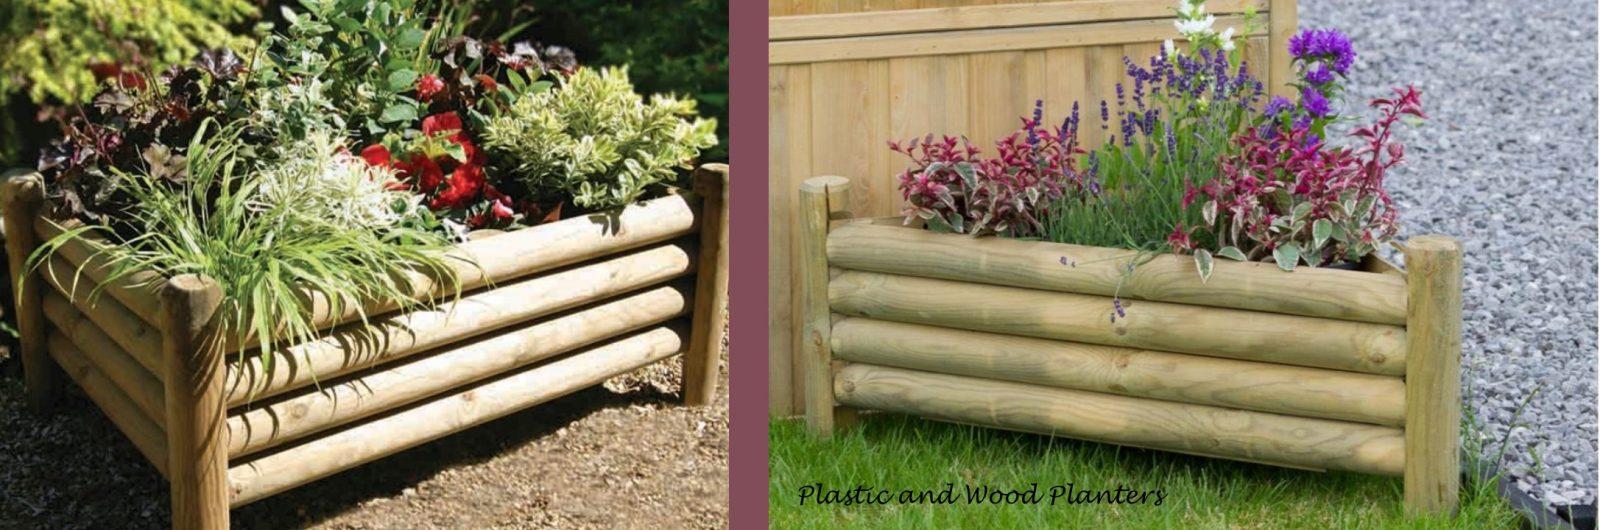 PLASTIC & WOOD PLANTERS